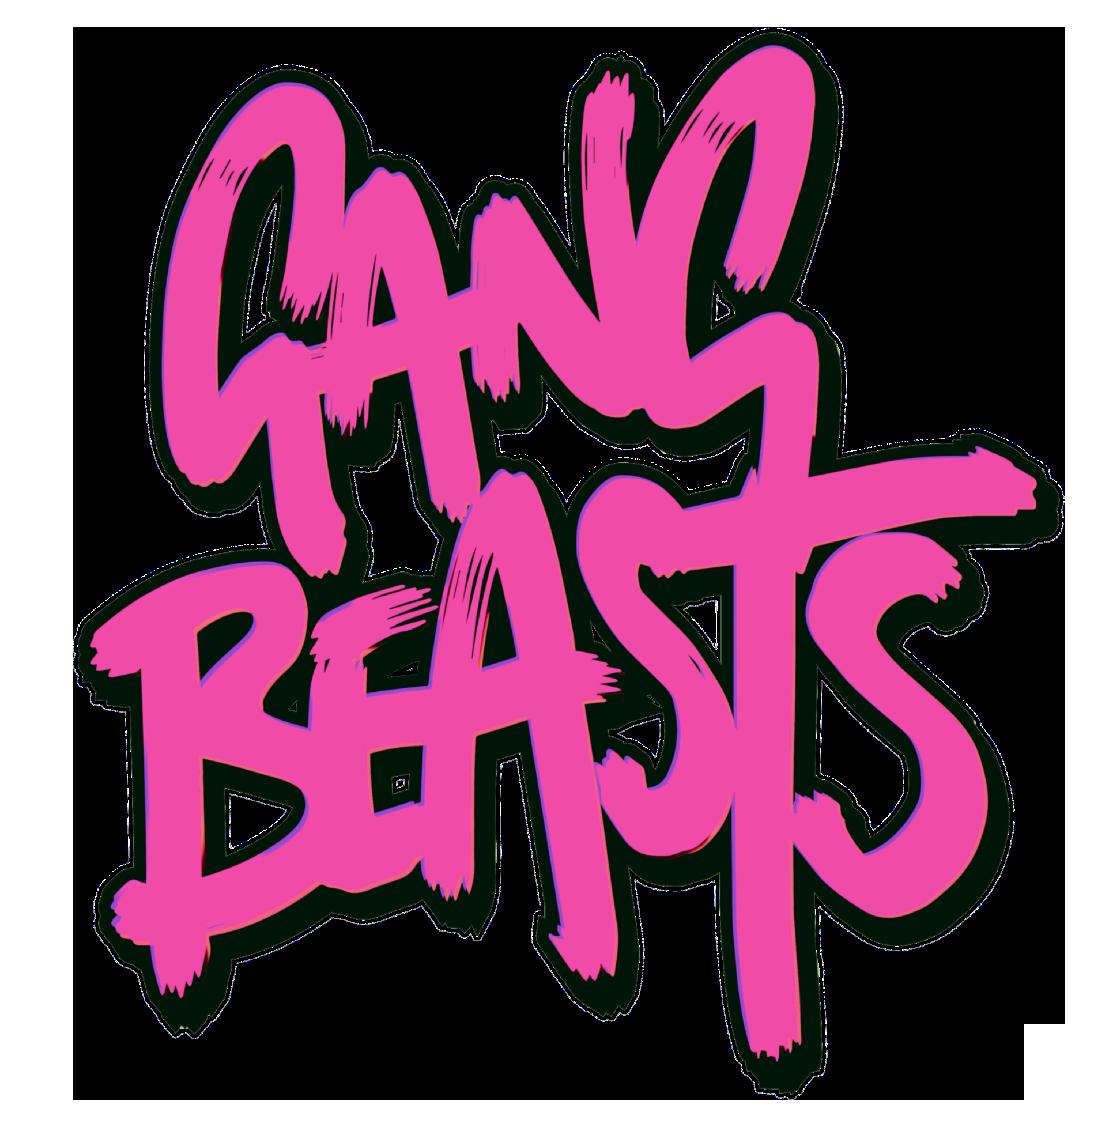 File:Gang Beasts Logo.png - Wikimedia Commons